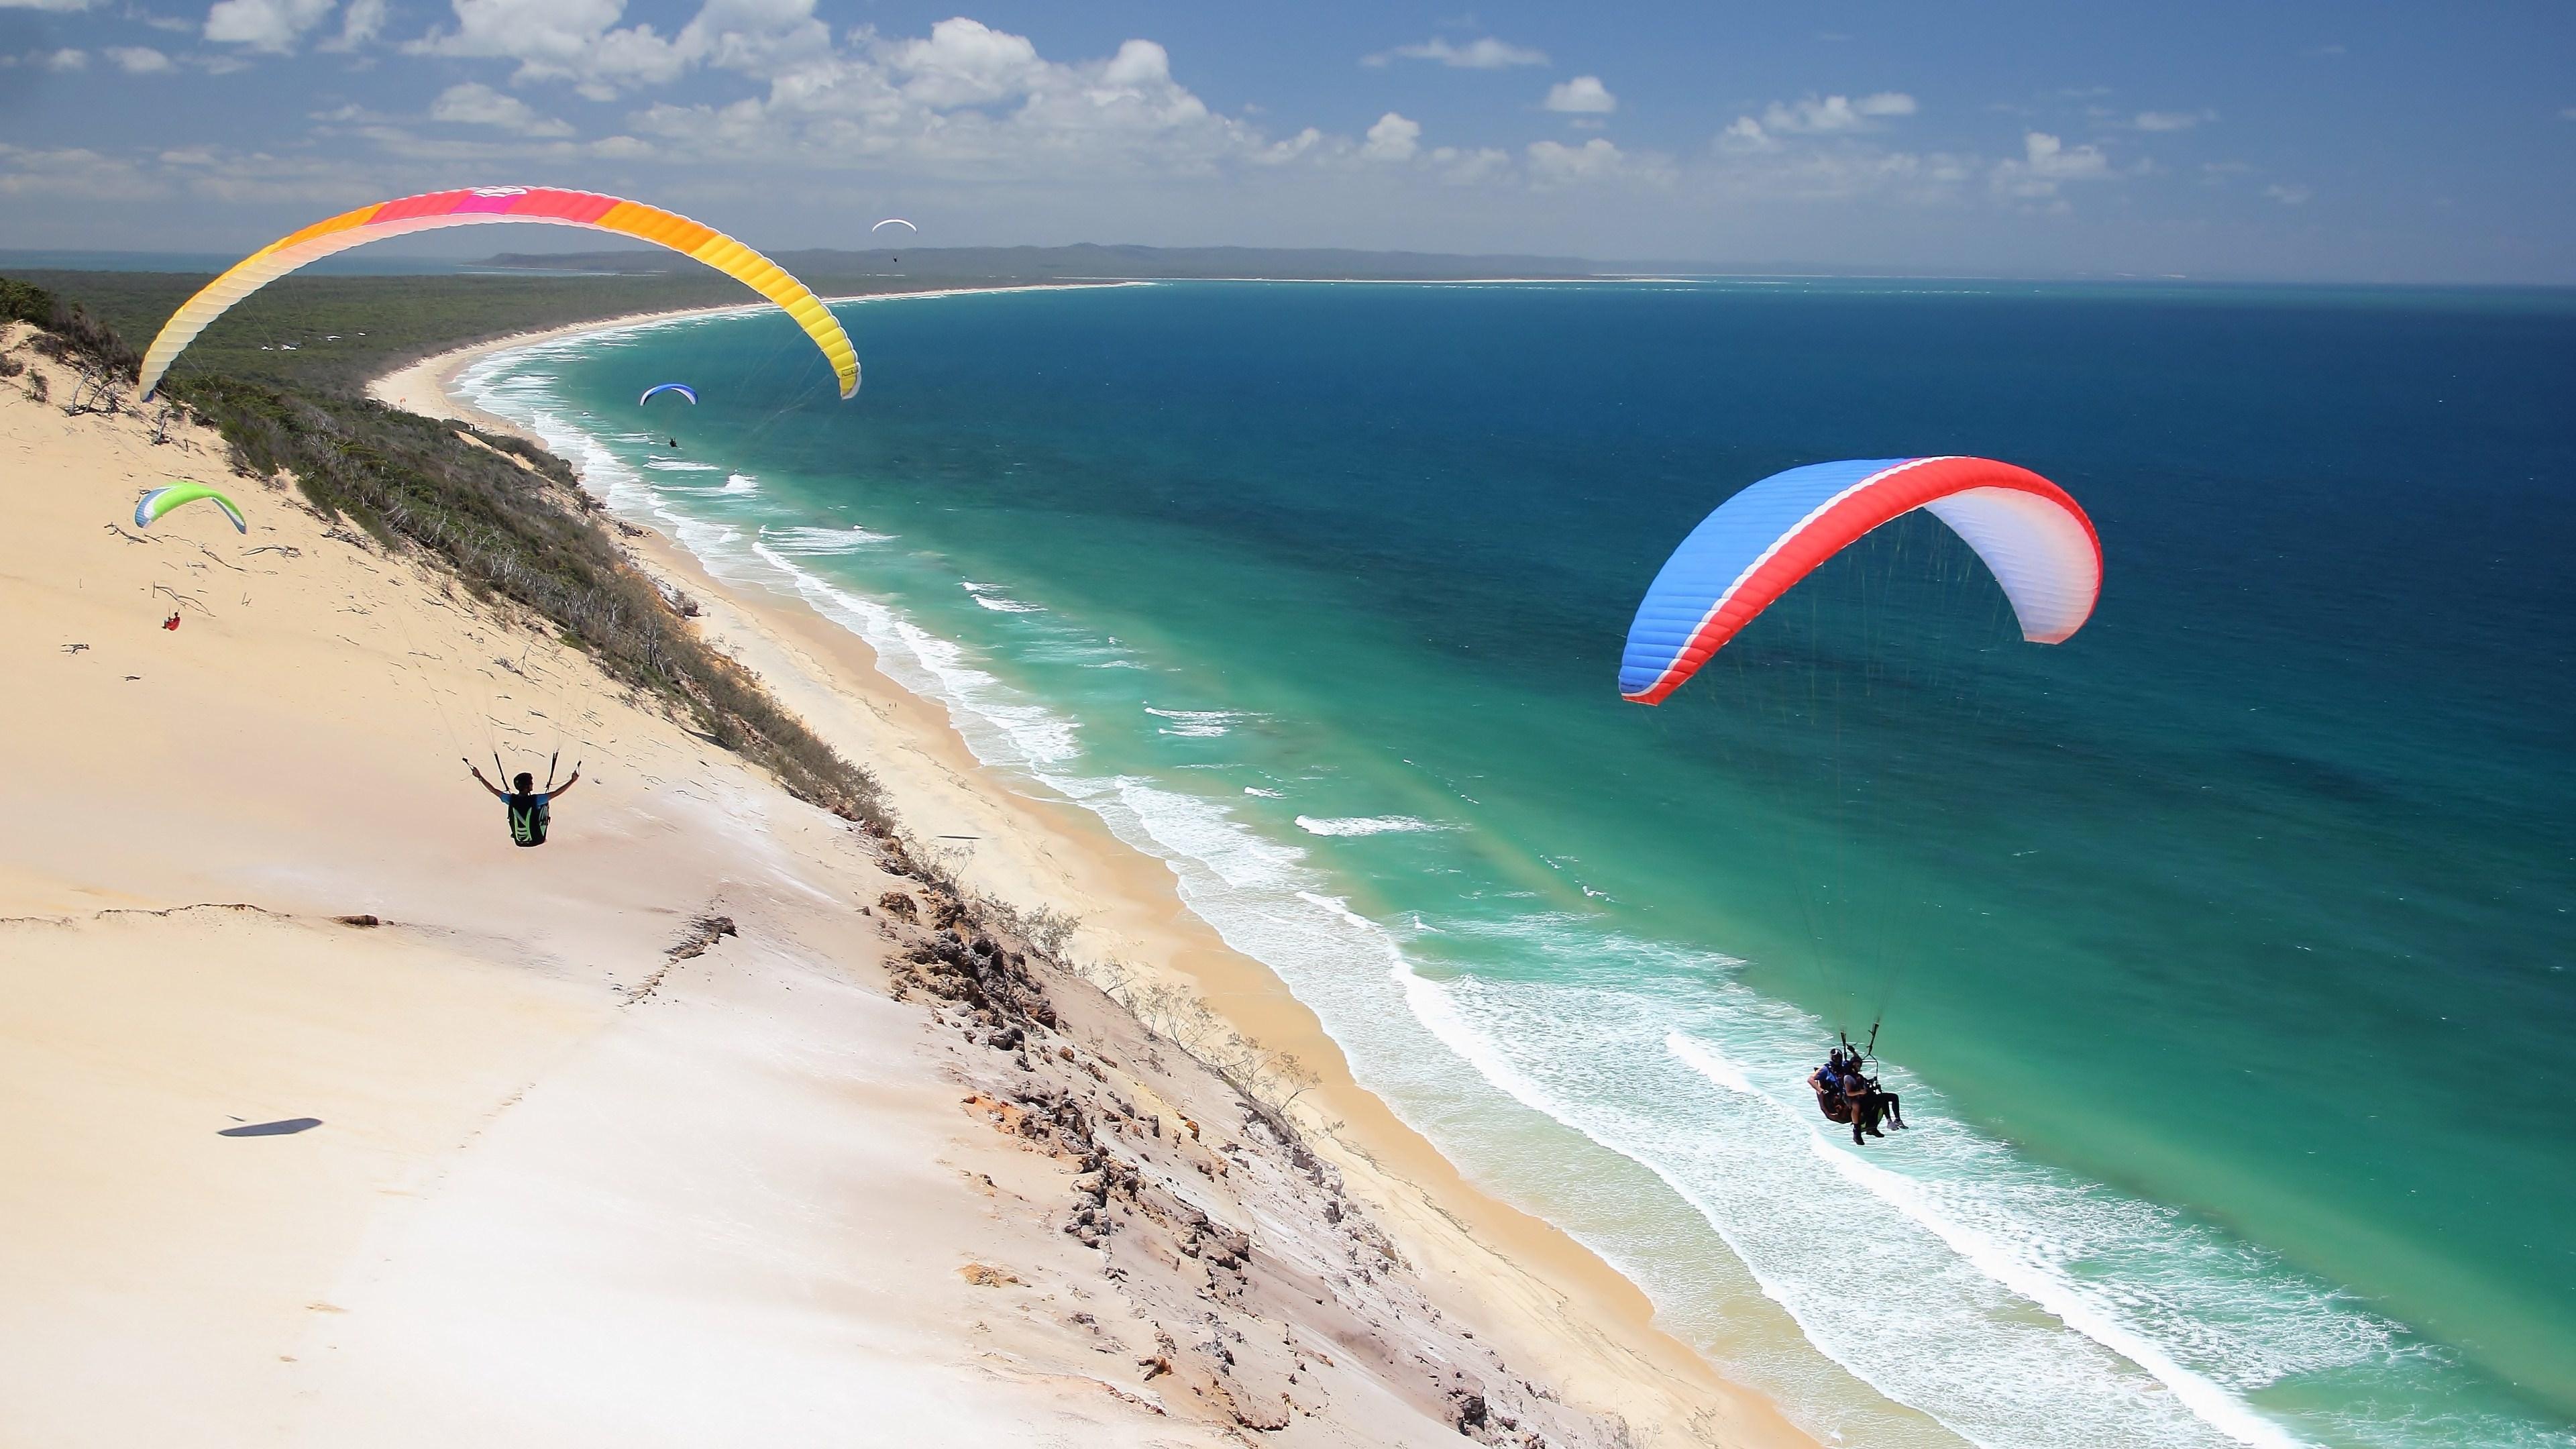 Paragliding High Definition